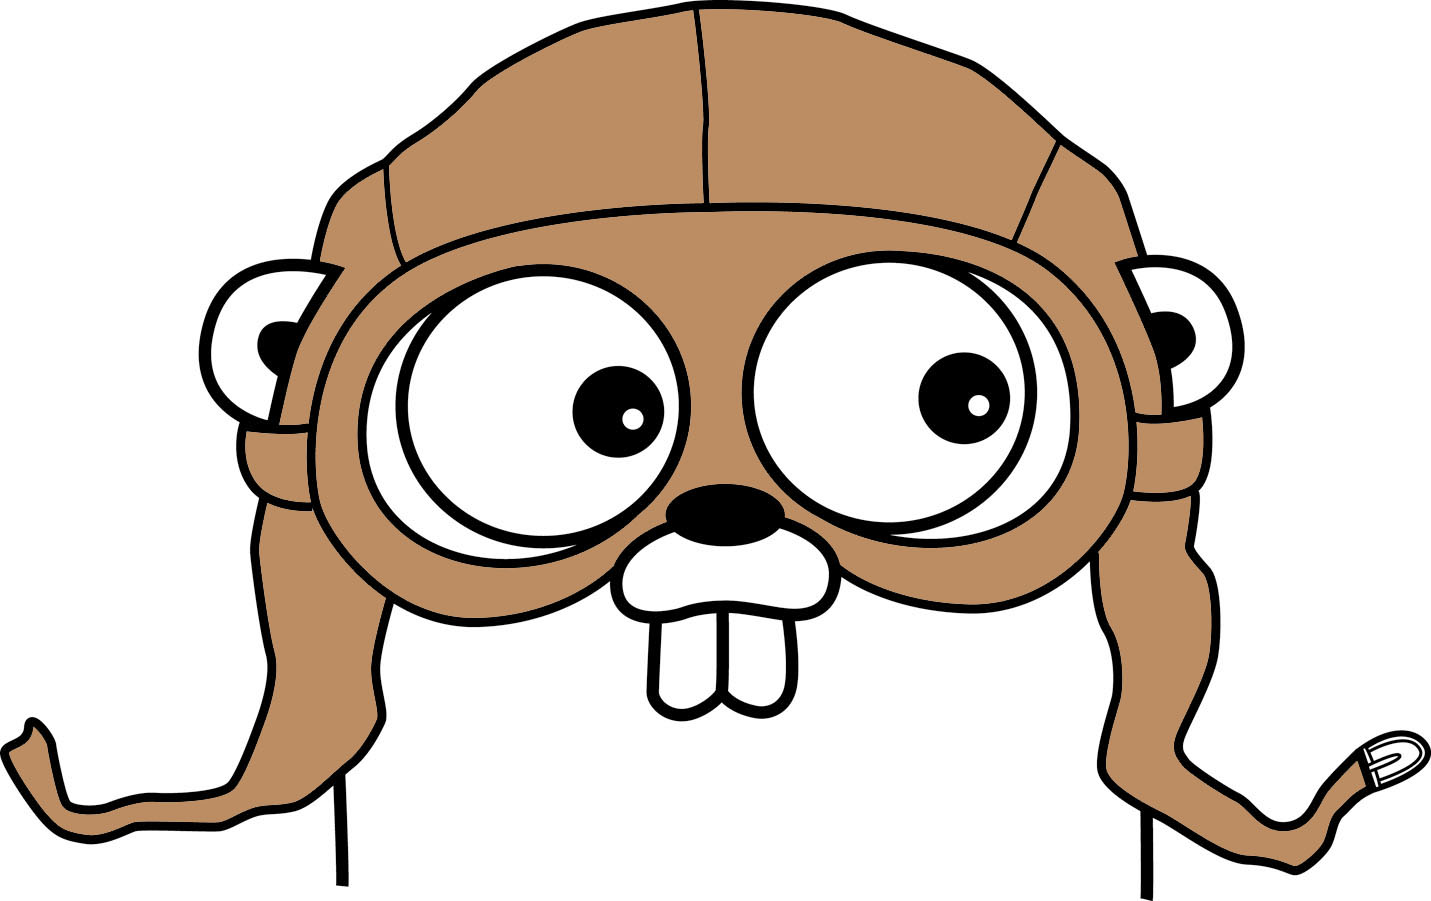 docgopher the go programming language